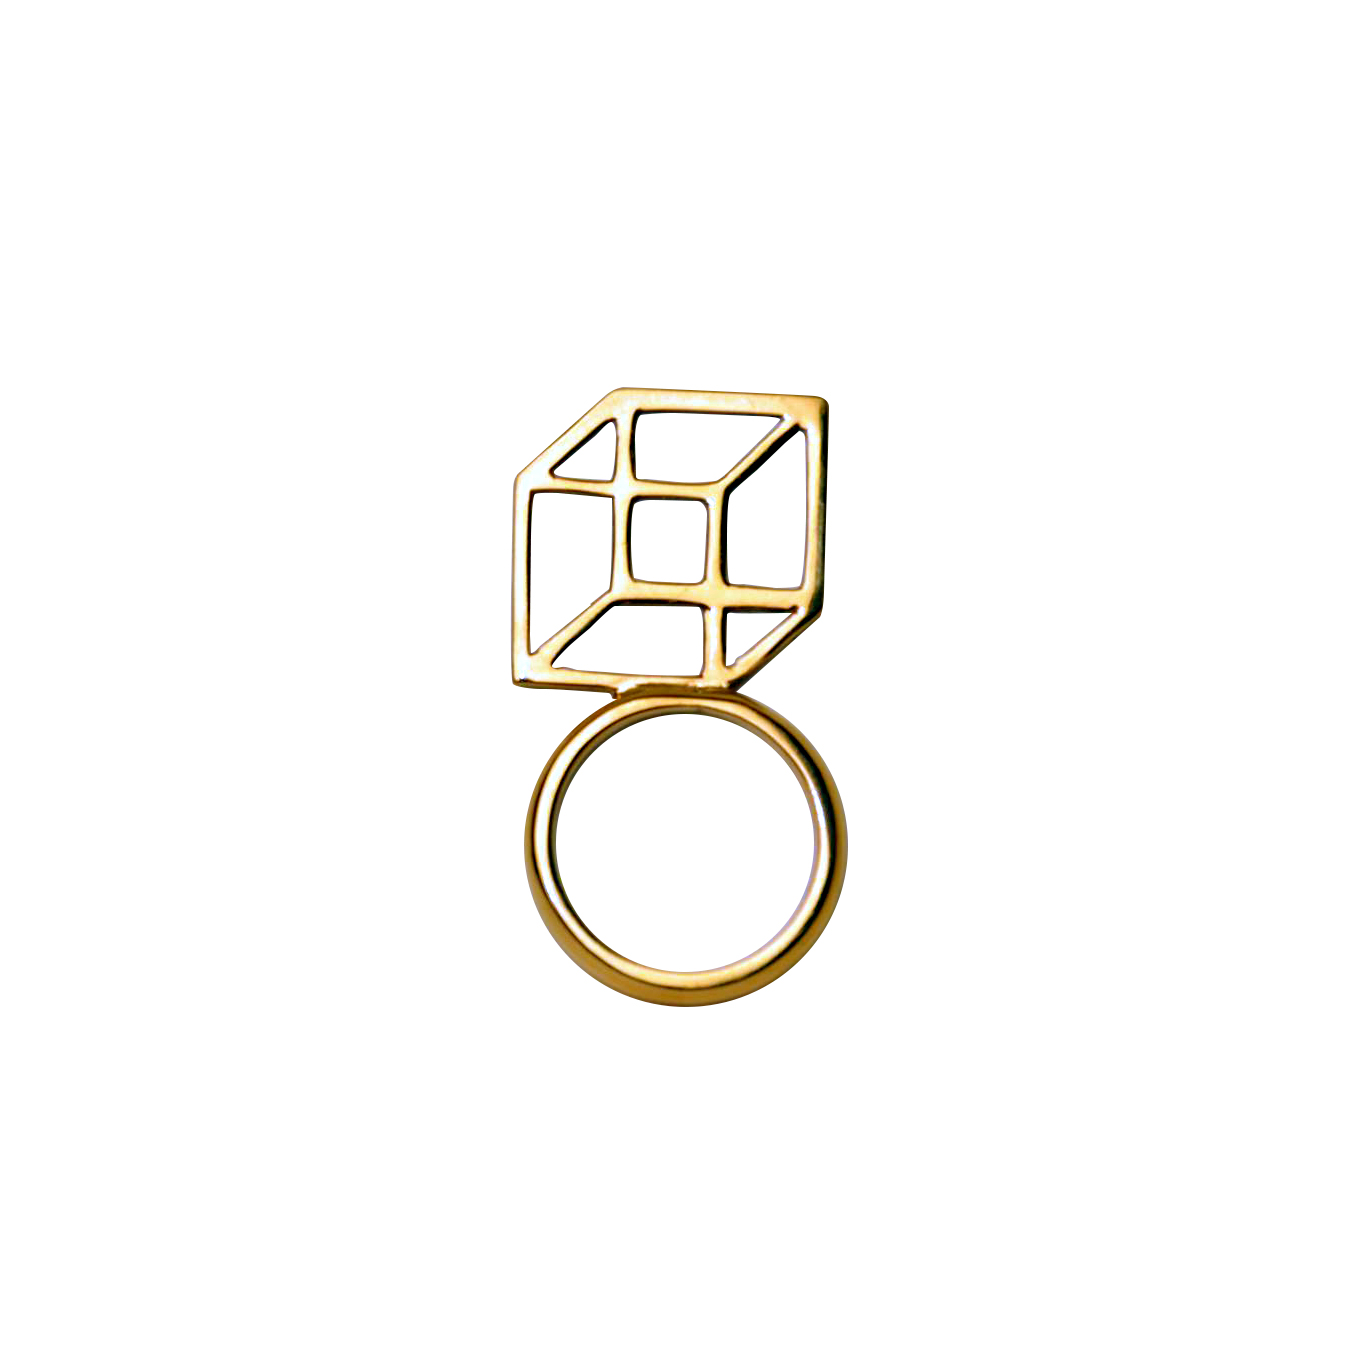 Bespoke work - cube ring